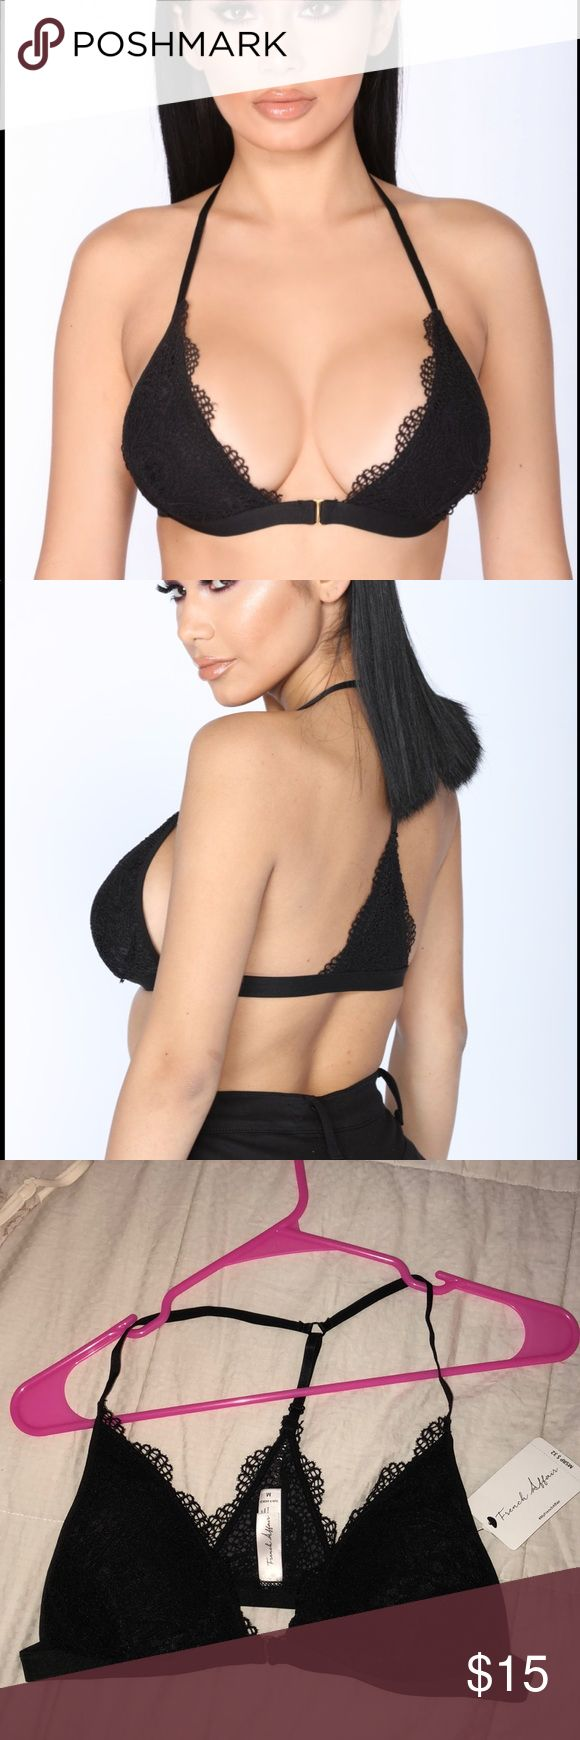 Black Lace Racerback Bra-let NWT size M Black Lacey racer back bra let (bra top!) with gorgeous gold center closure. Fashion Nova Tops Crop Tops